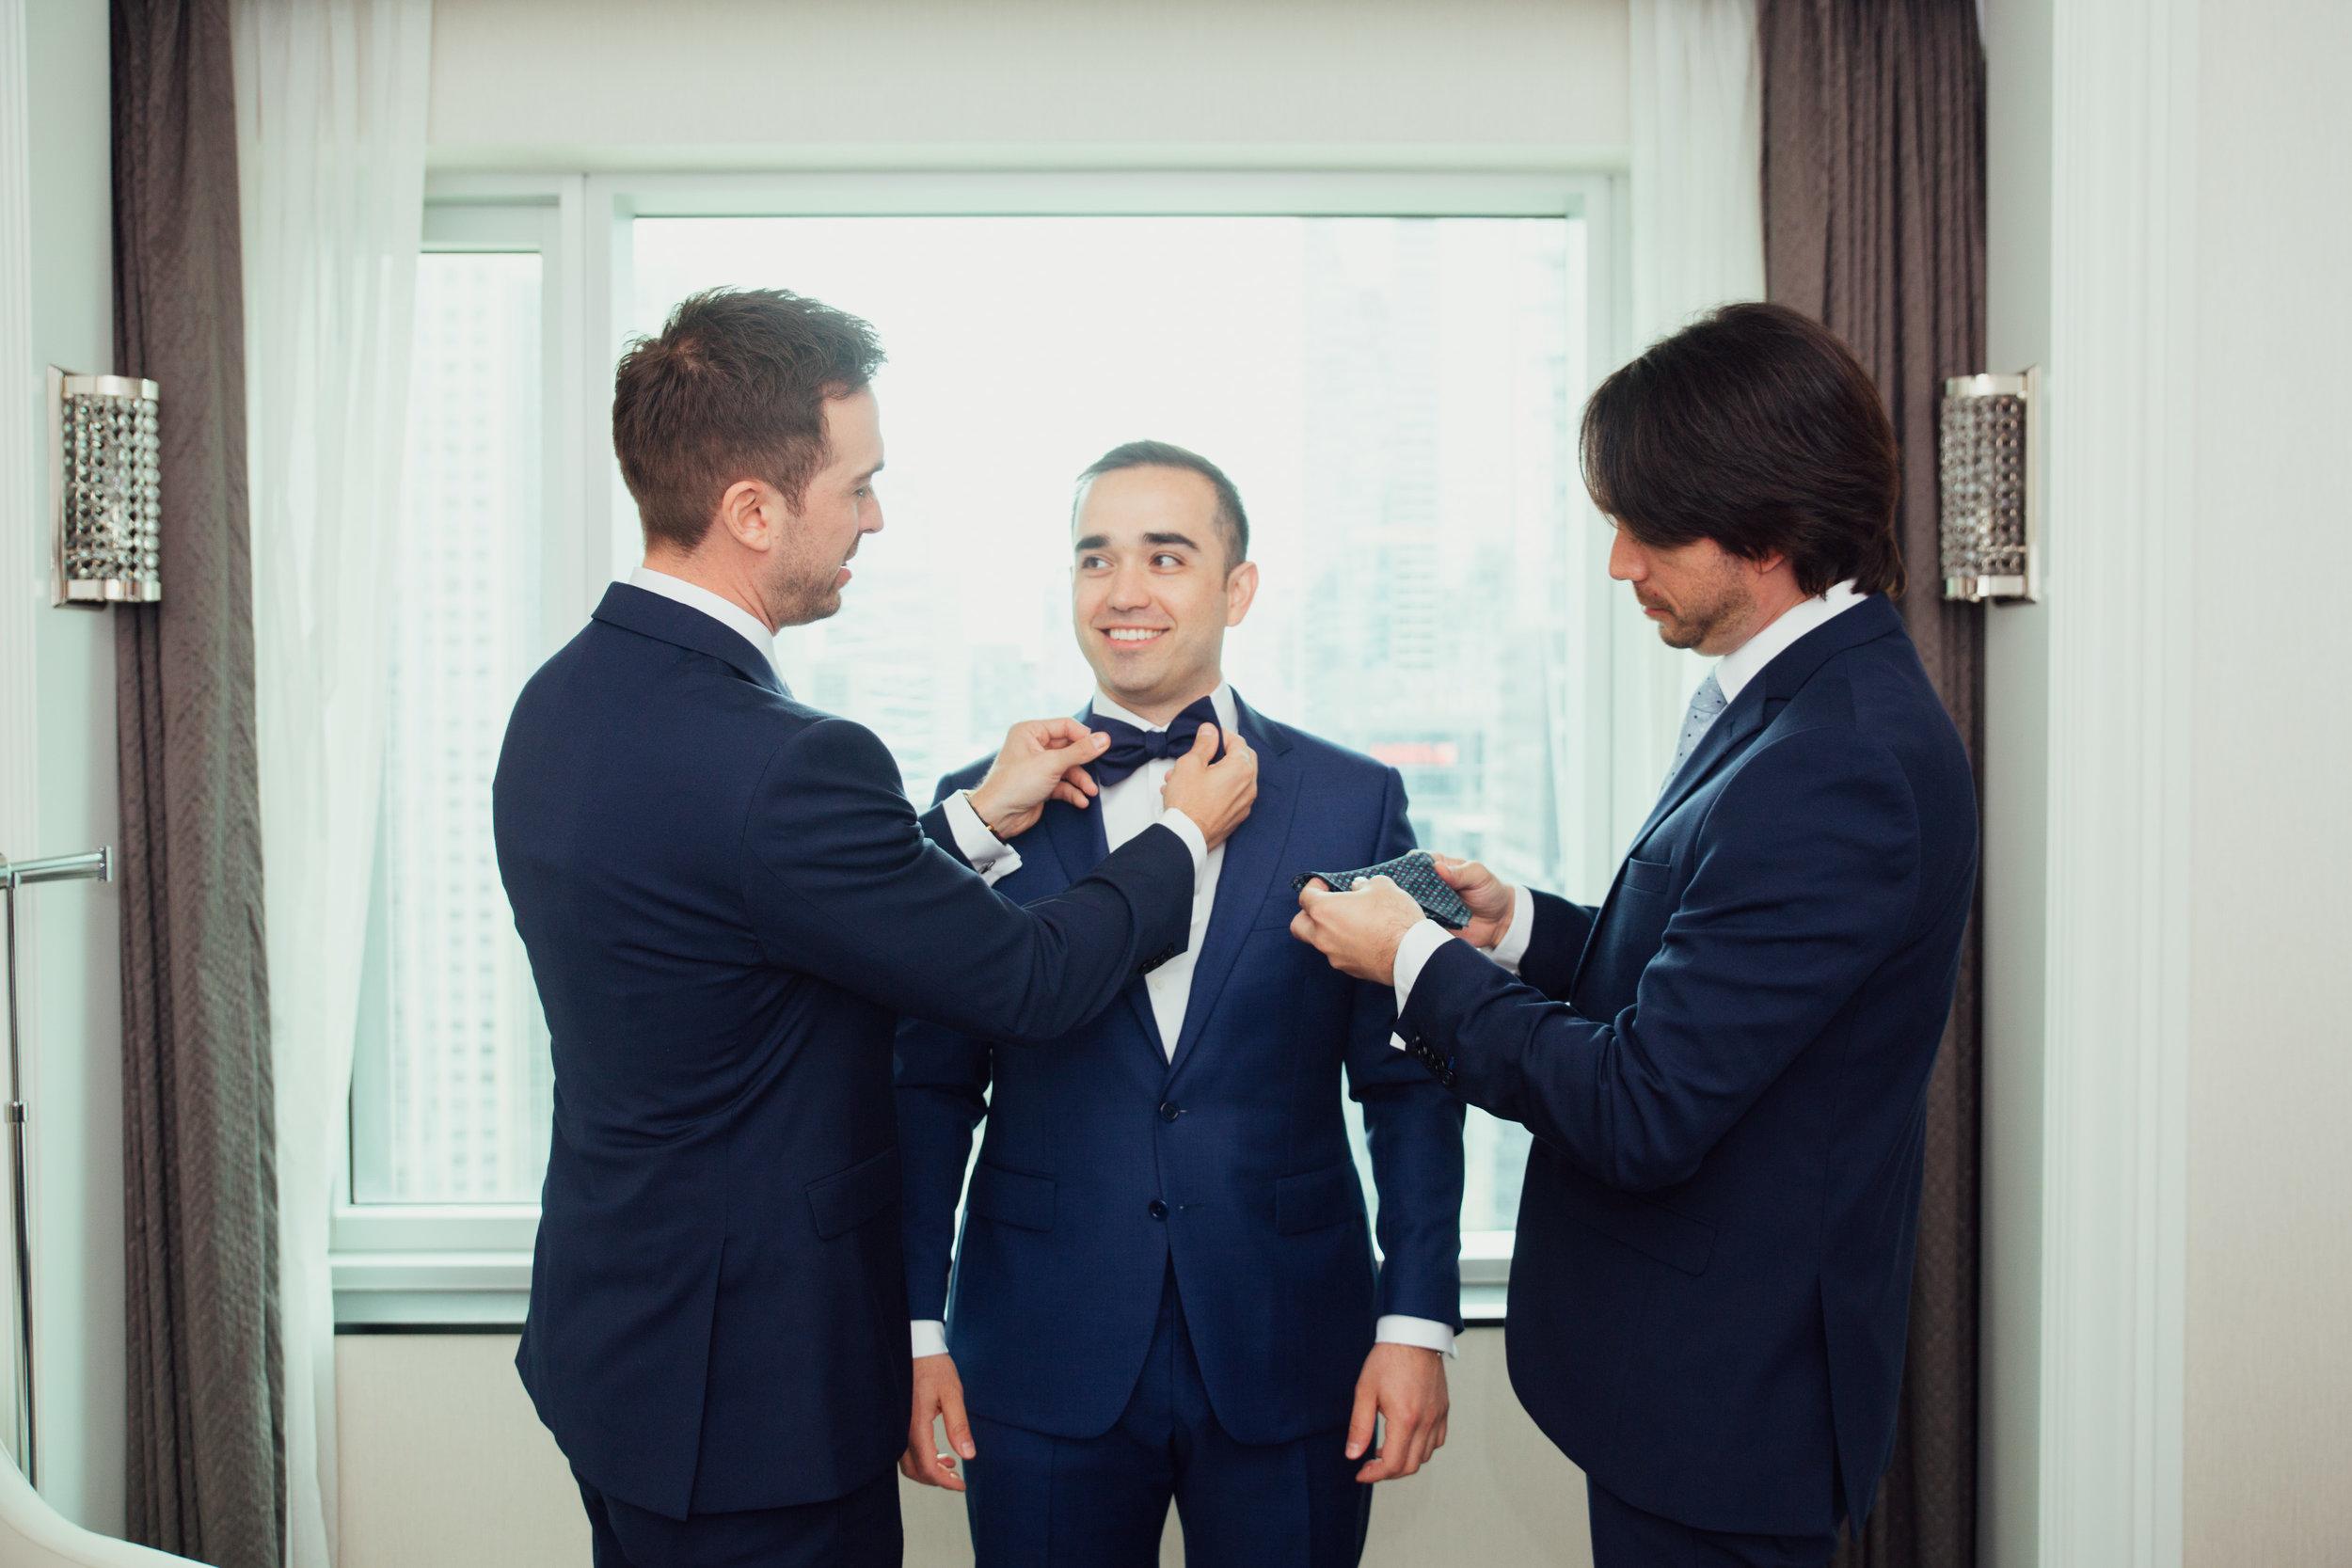 cleland-studios-wedding-photography-11.jpg